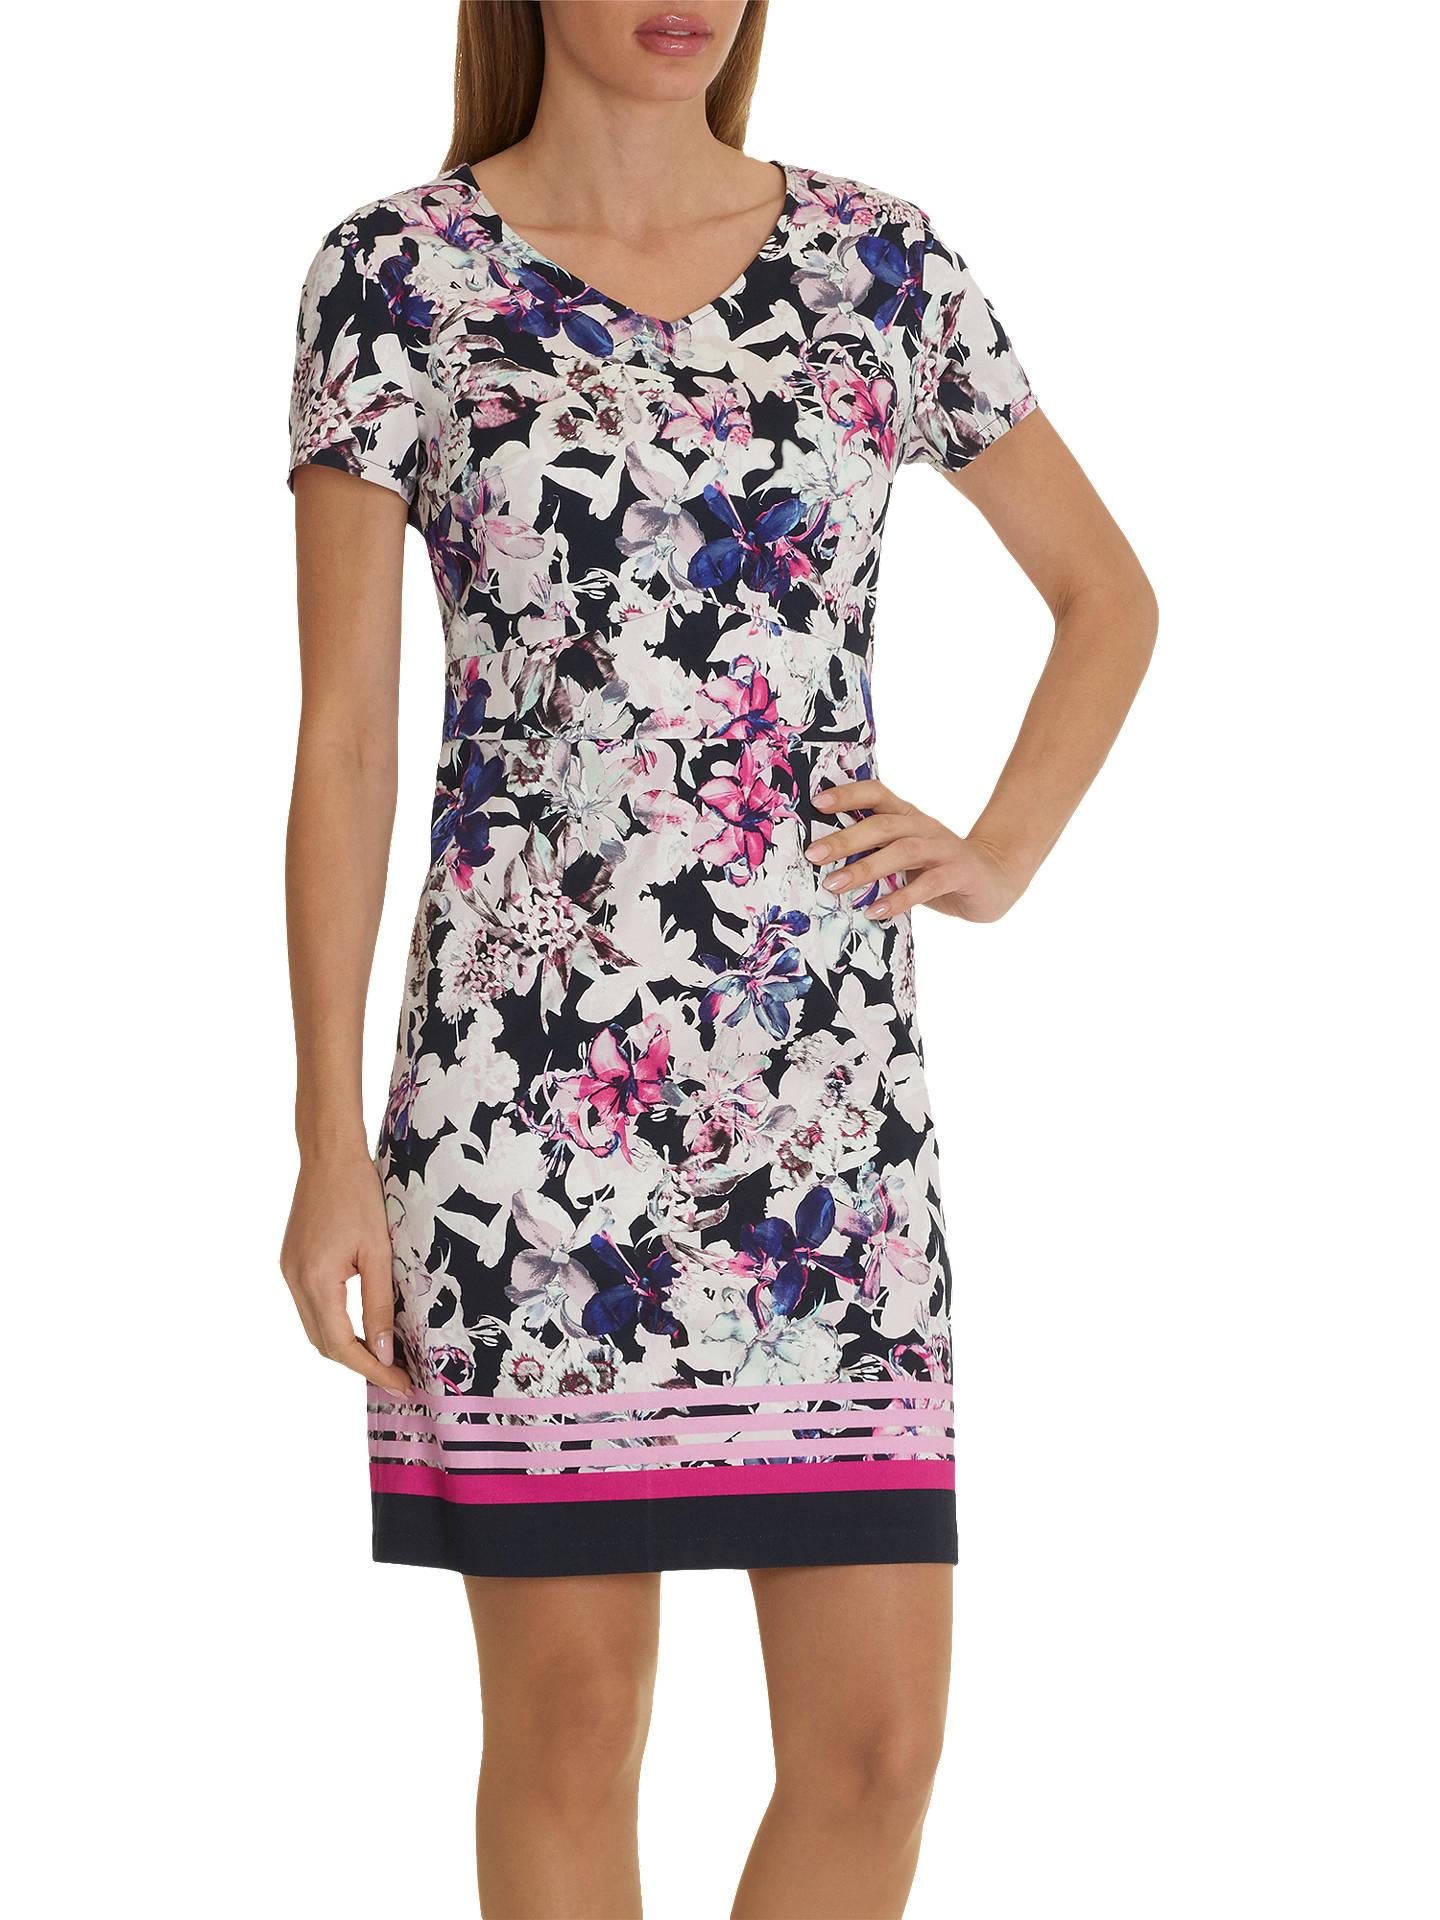 3f56da1195b0 Buy Betty Barclay Floral Print Dress